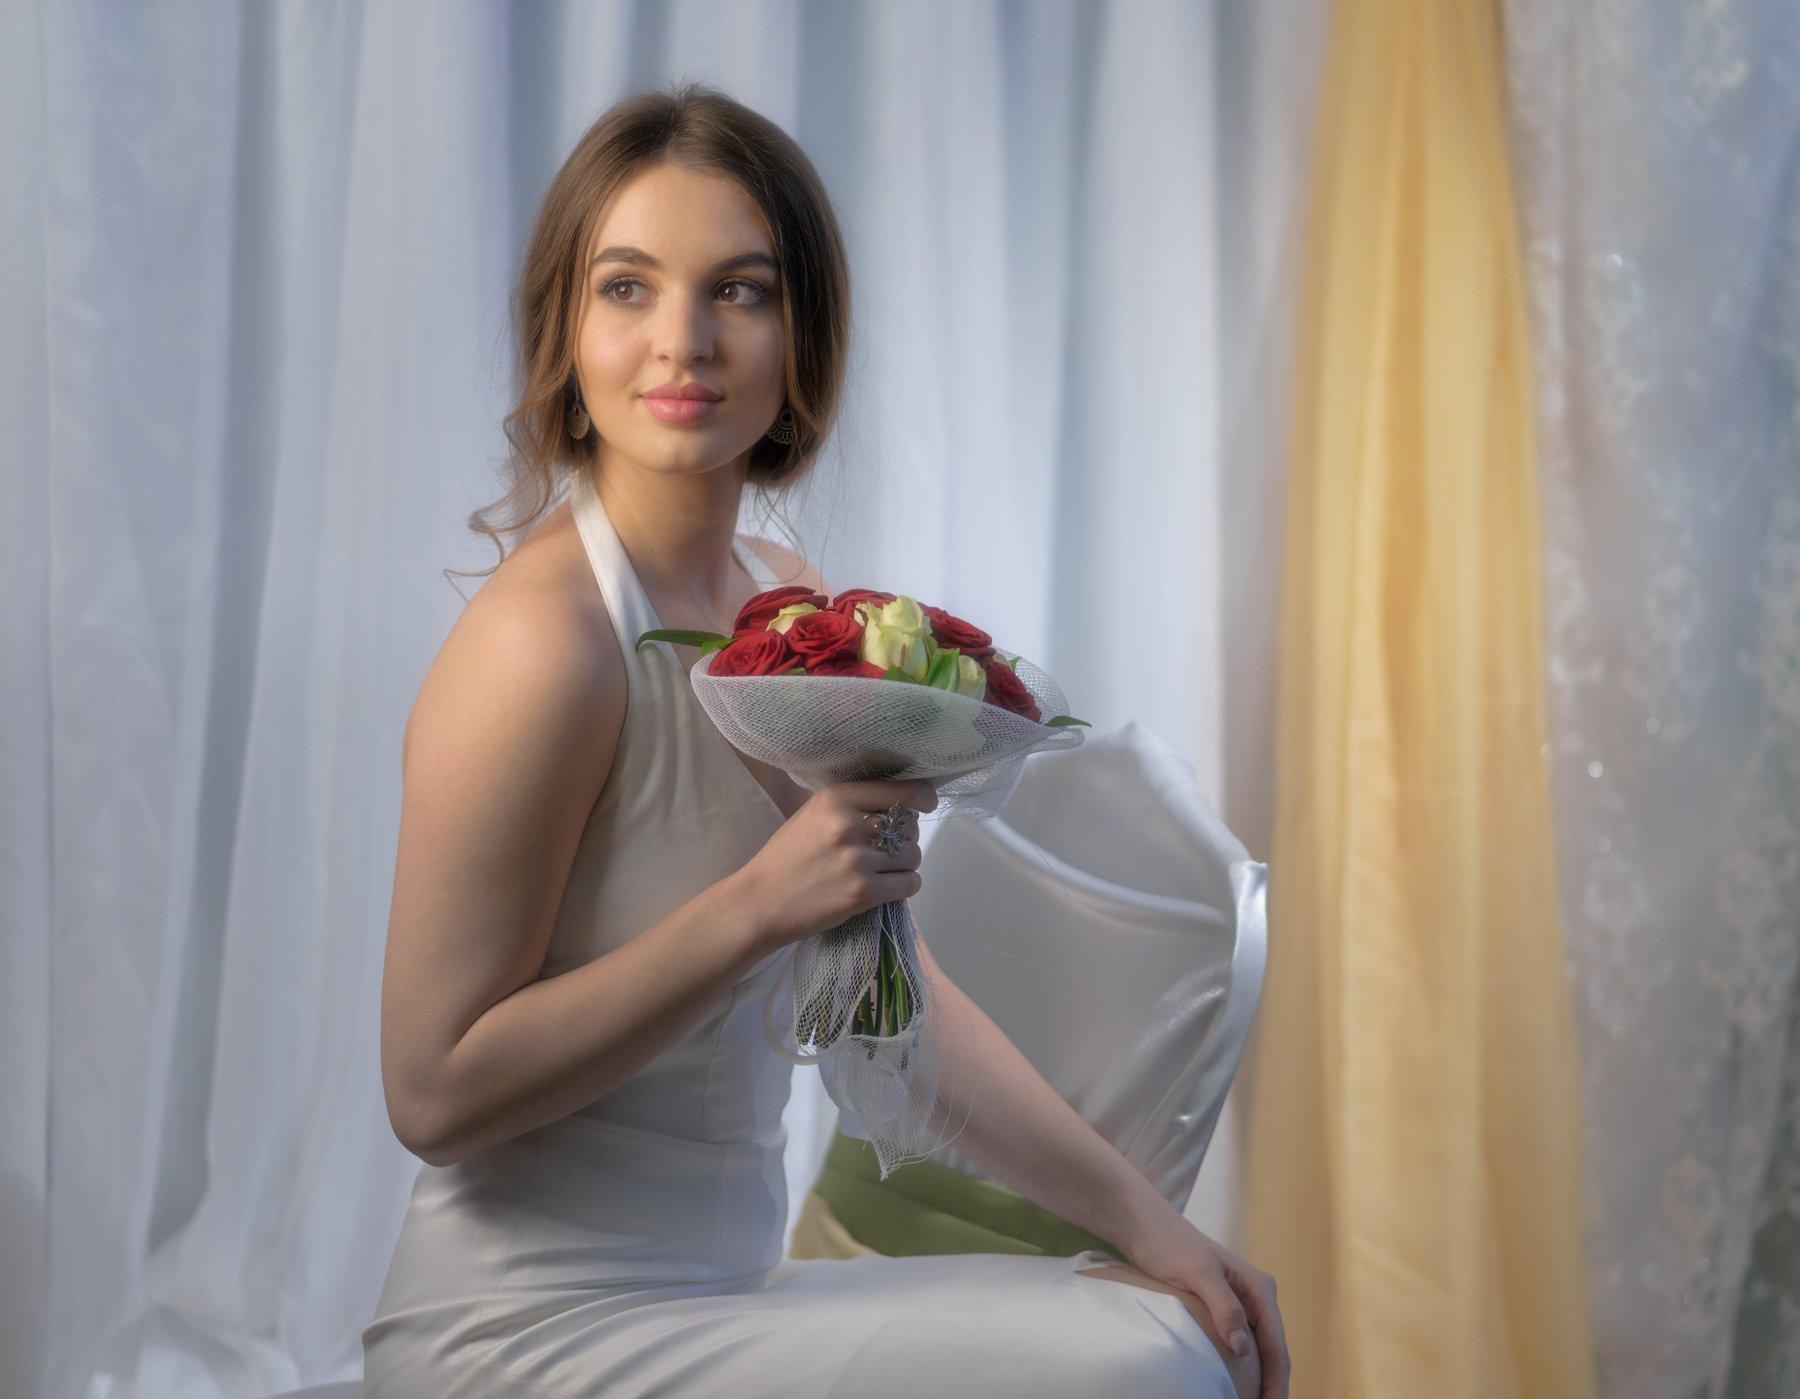 светлый образ на fujifilm photoday , краснодар ., Александр Плеханов